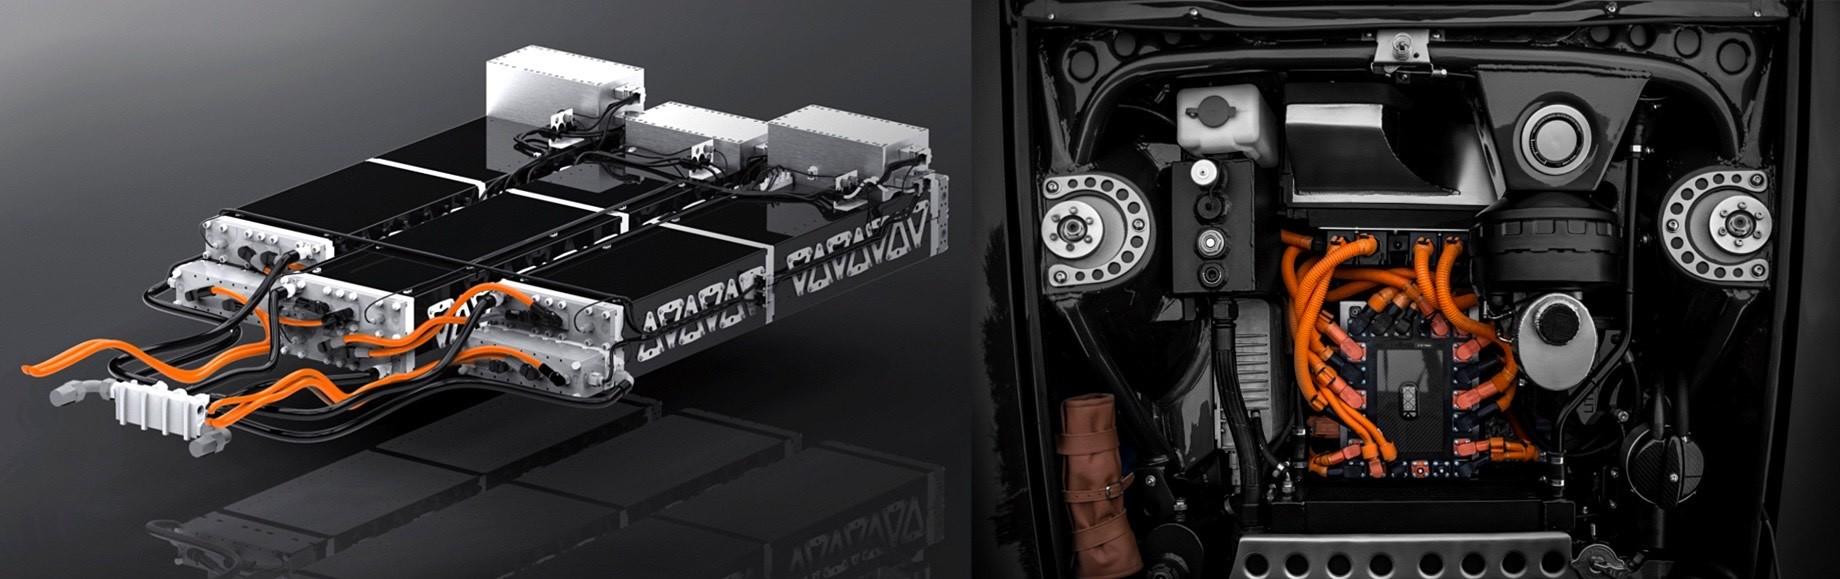 Электрокар Totem GT Electric за € 430 000, подготовлен к производству